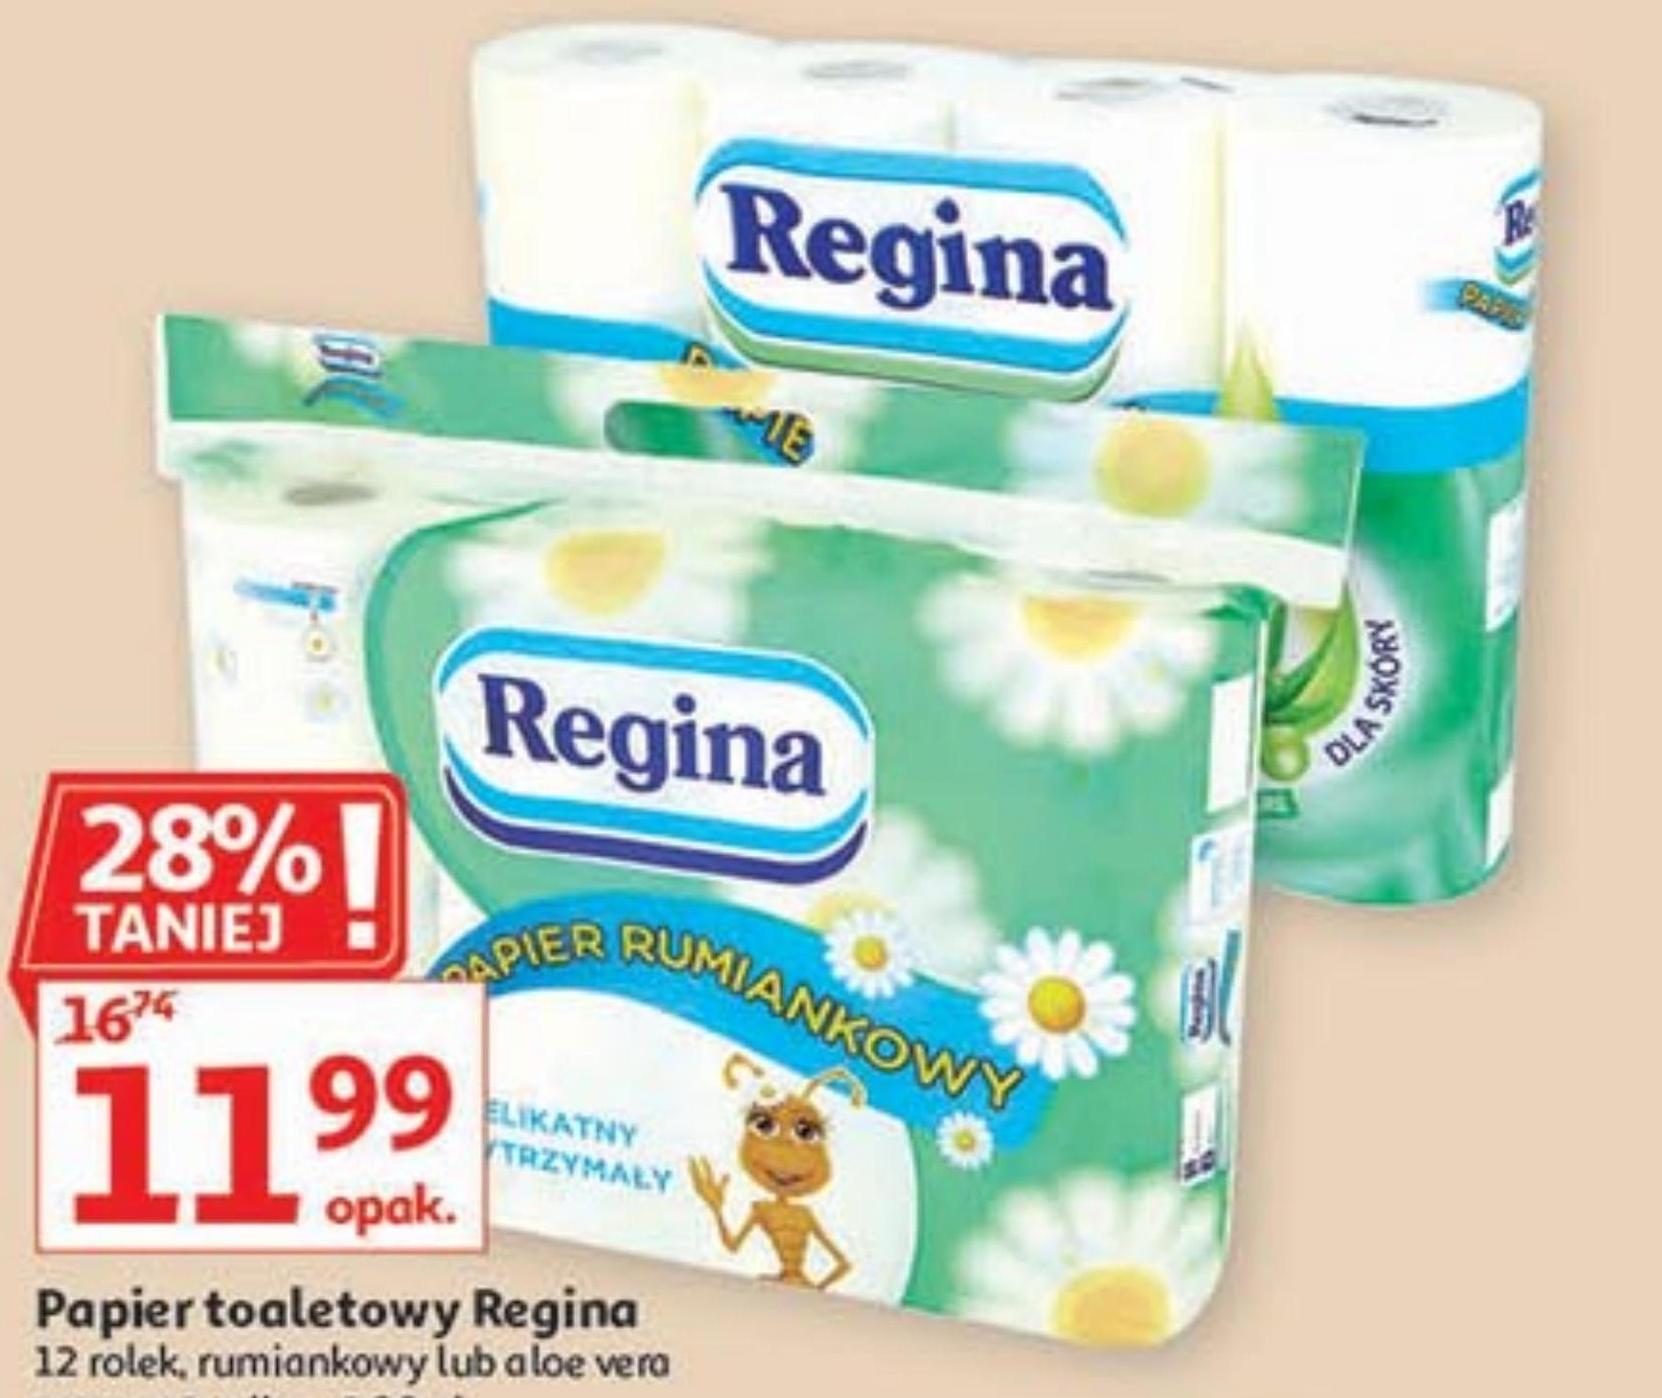 Papier toaletowy Regina niska cena